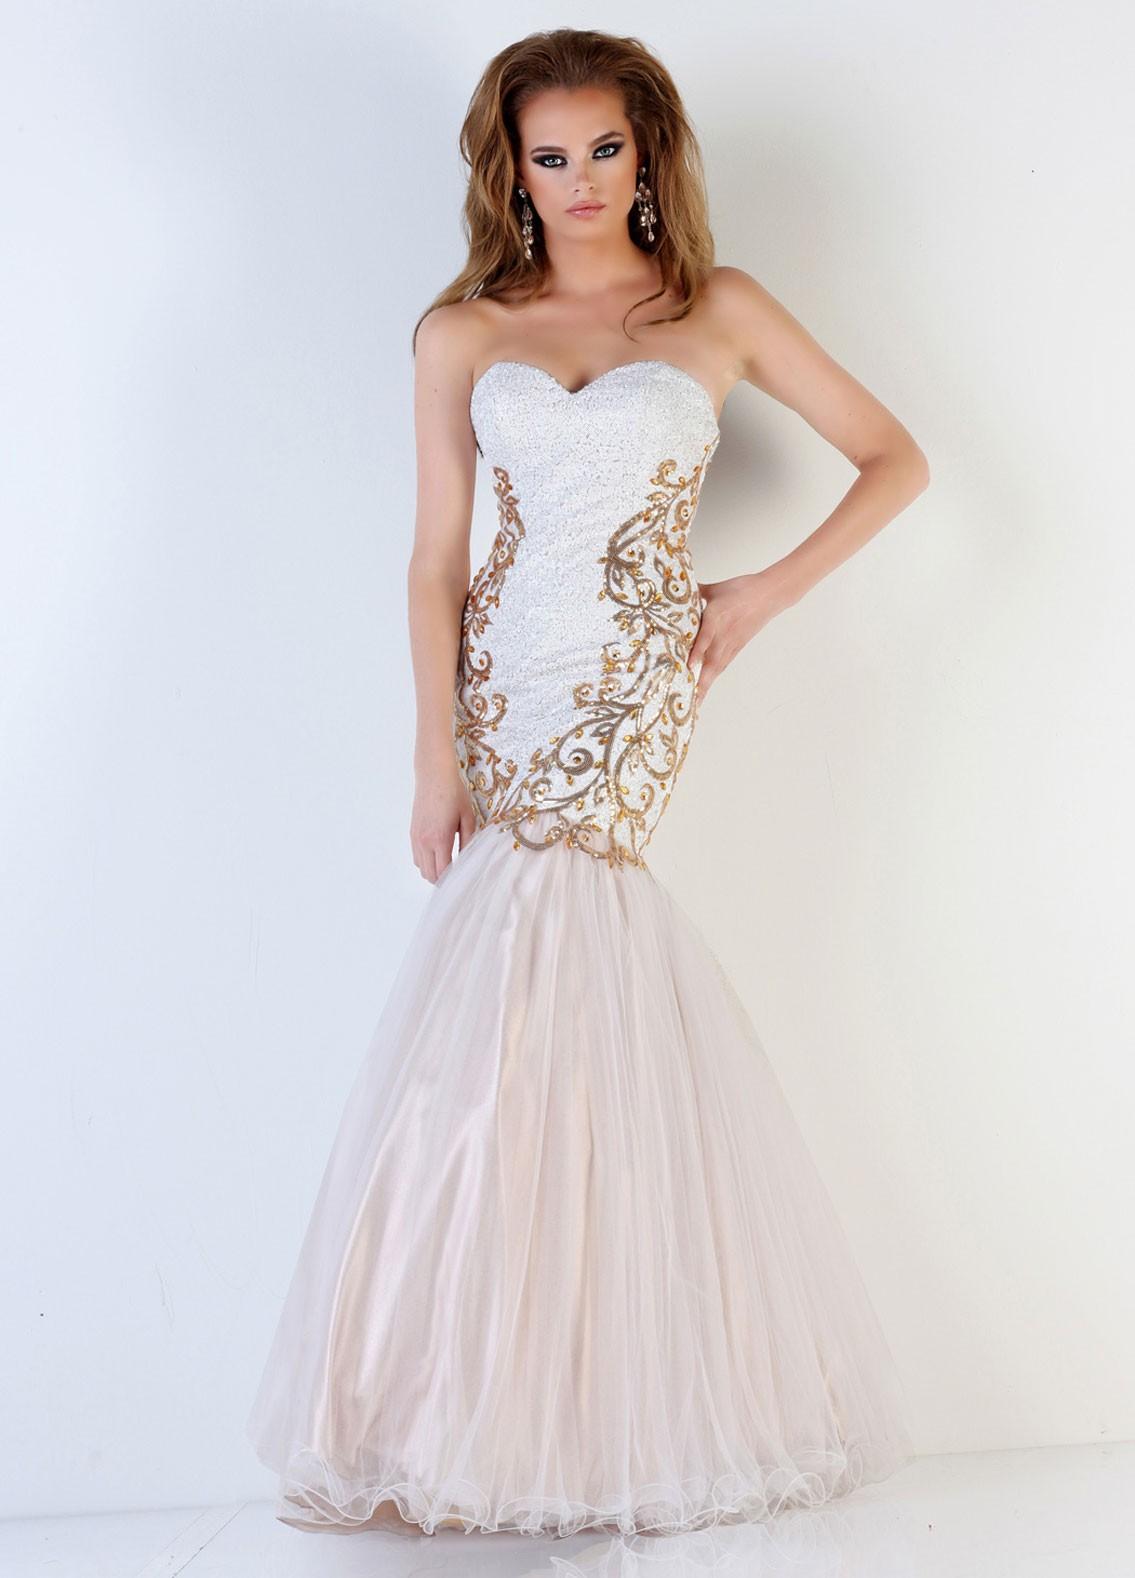 White Prom Dresses Dressedupgirl Com